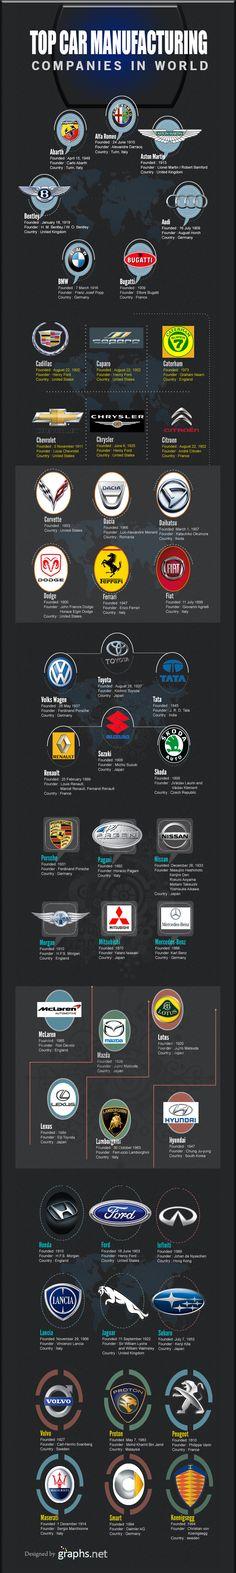 (we miss Plymouth, Pontiac, Mercury, Oldsmobile, etc.)Top Car Manufacturing Companies